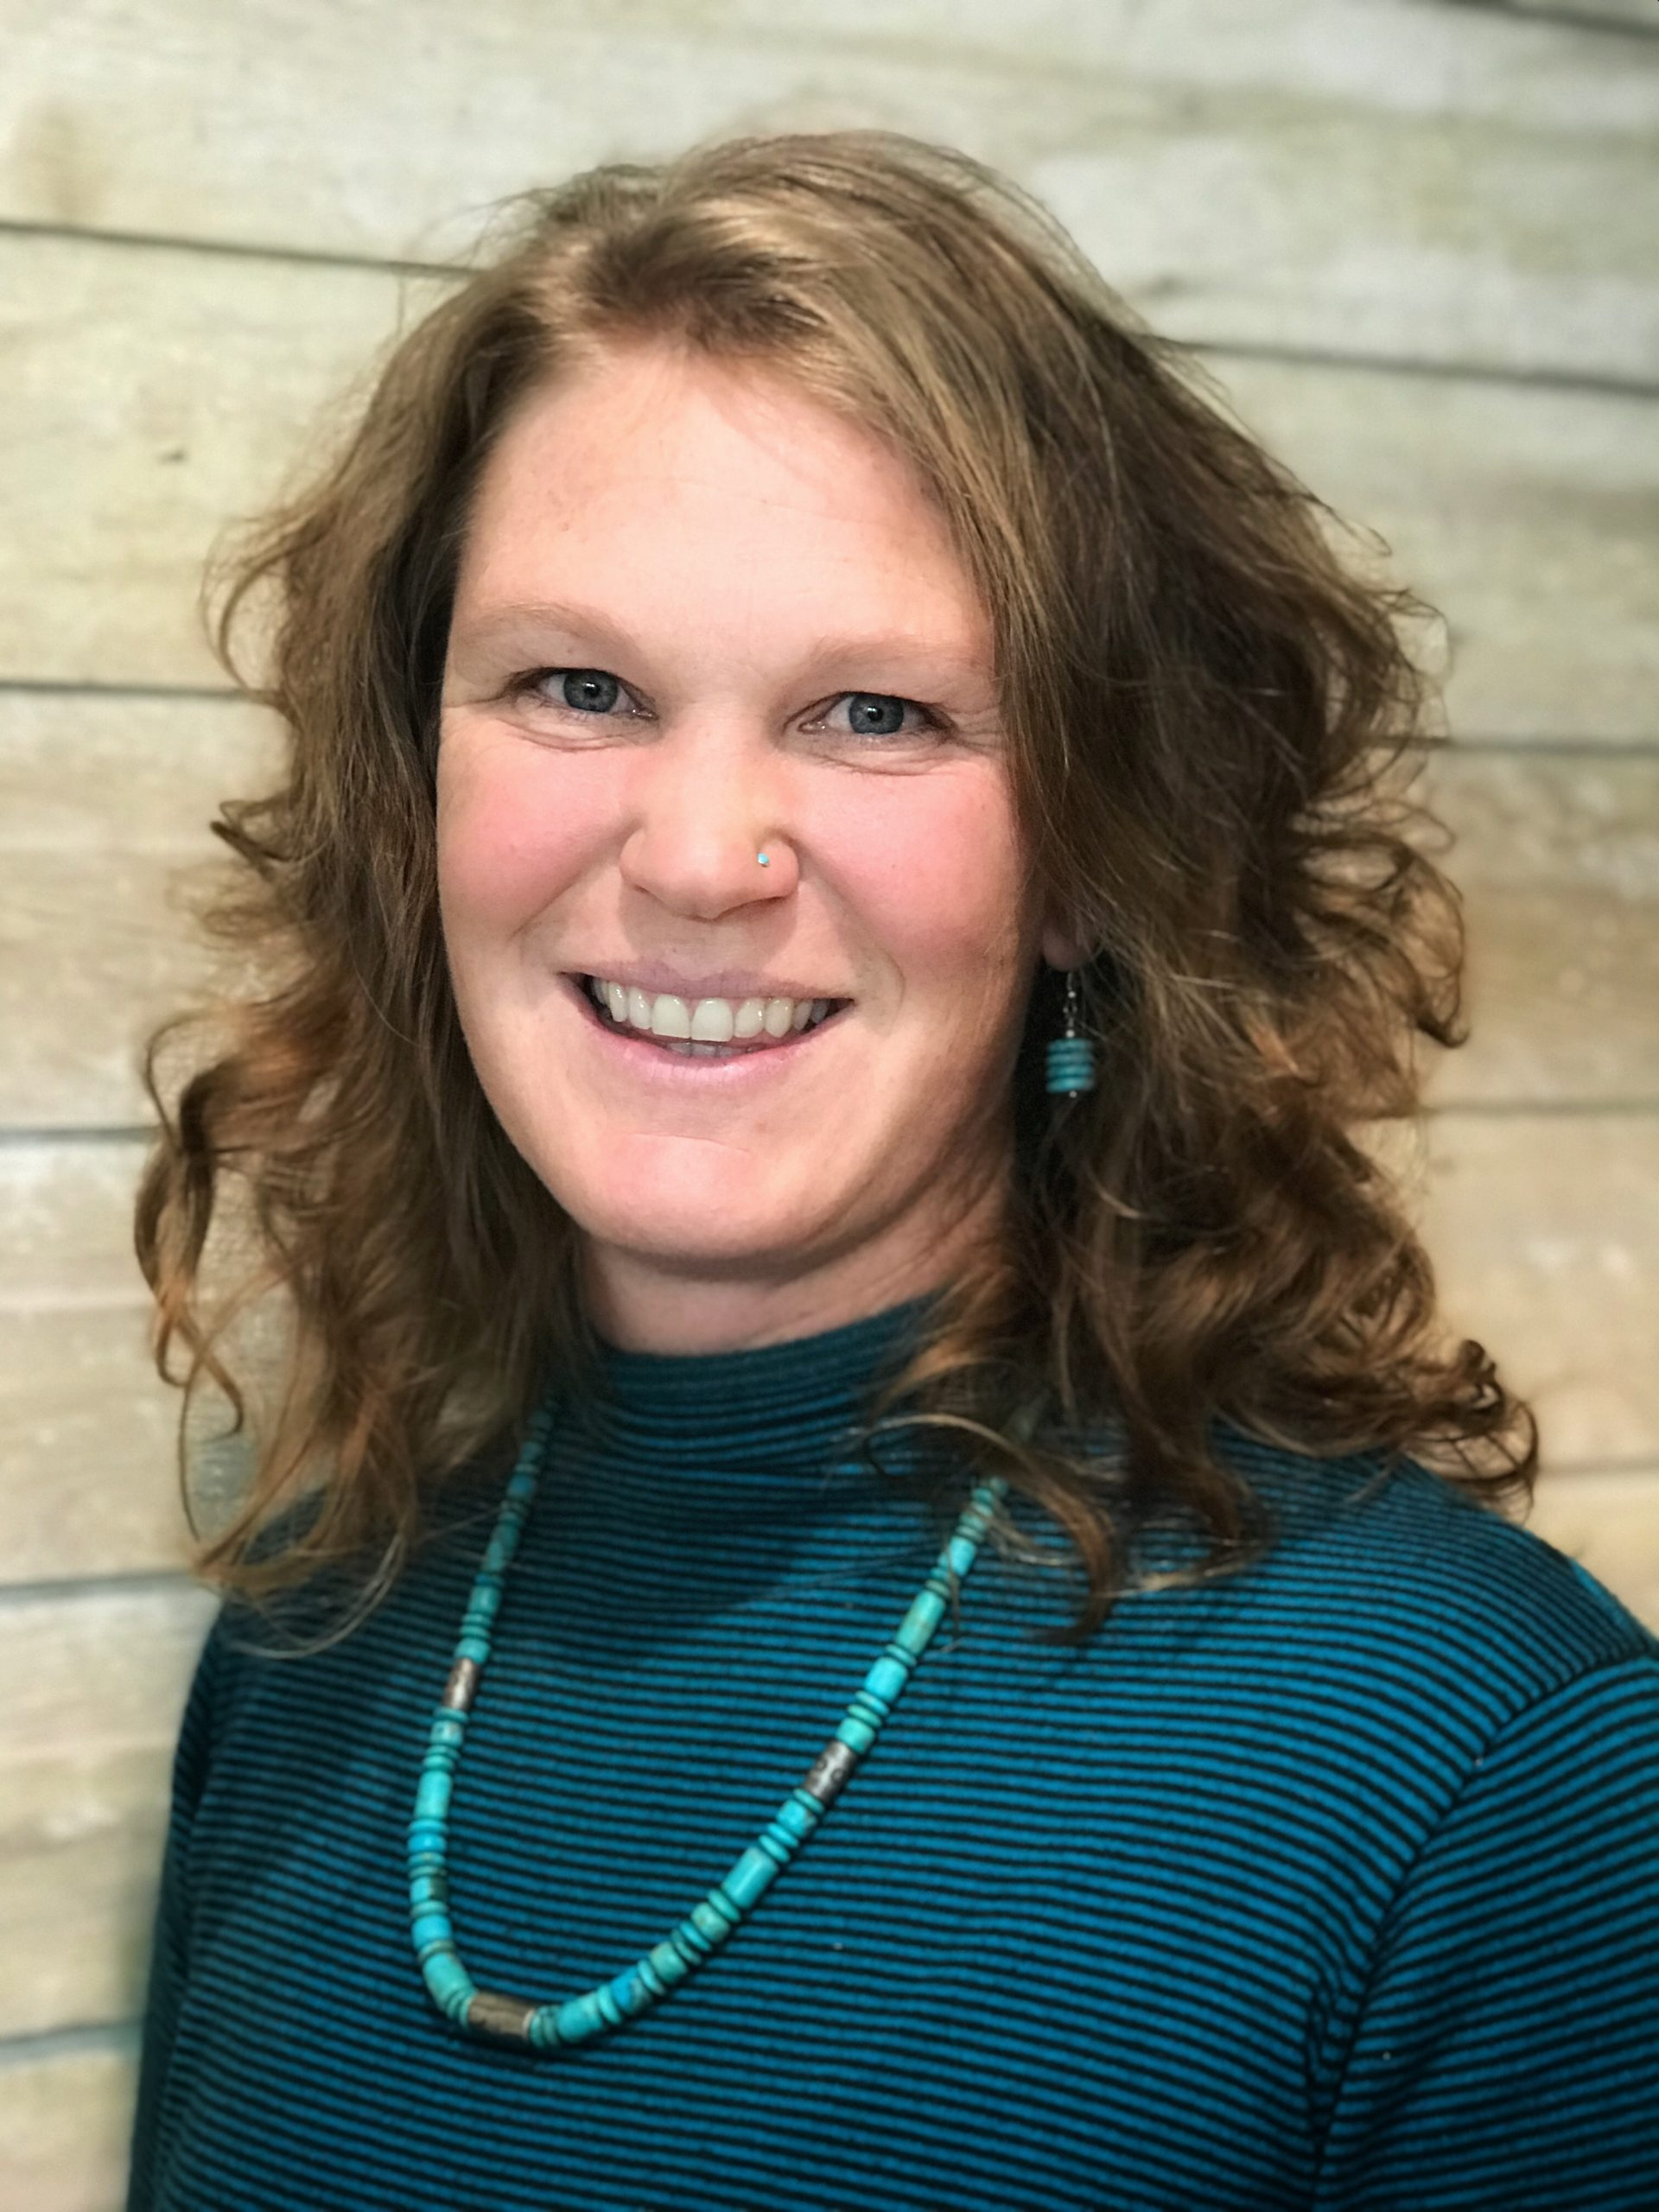 Dara L. Sander (Orman), NP   Family Nurse Practitioner in